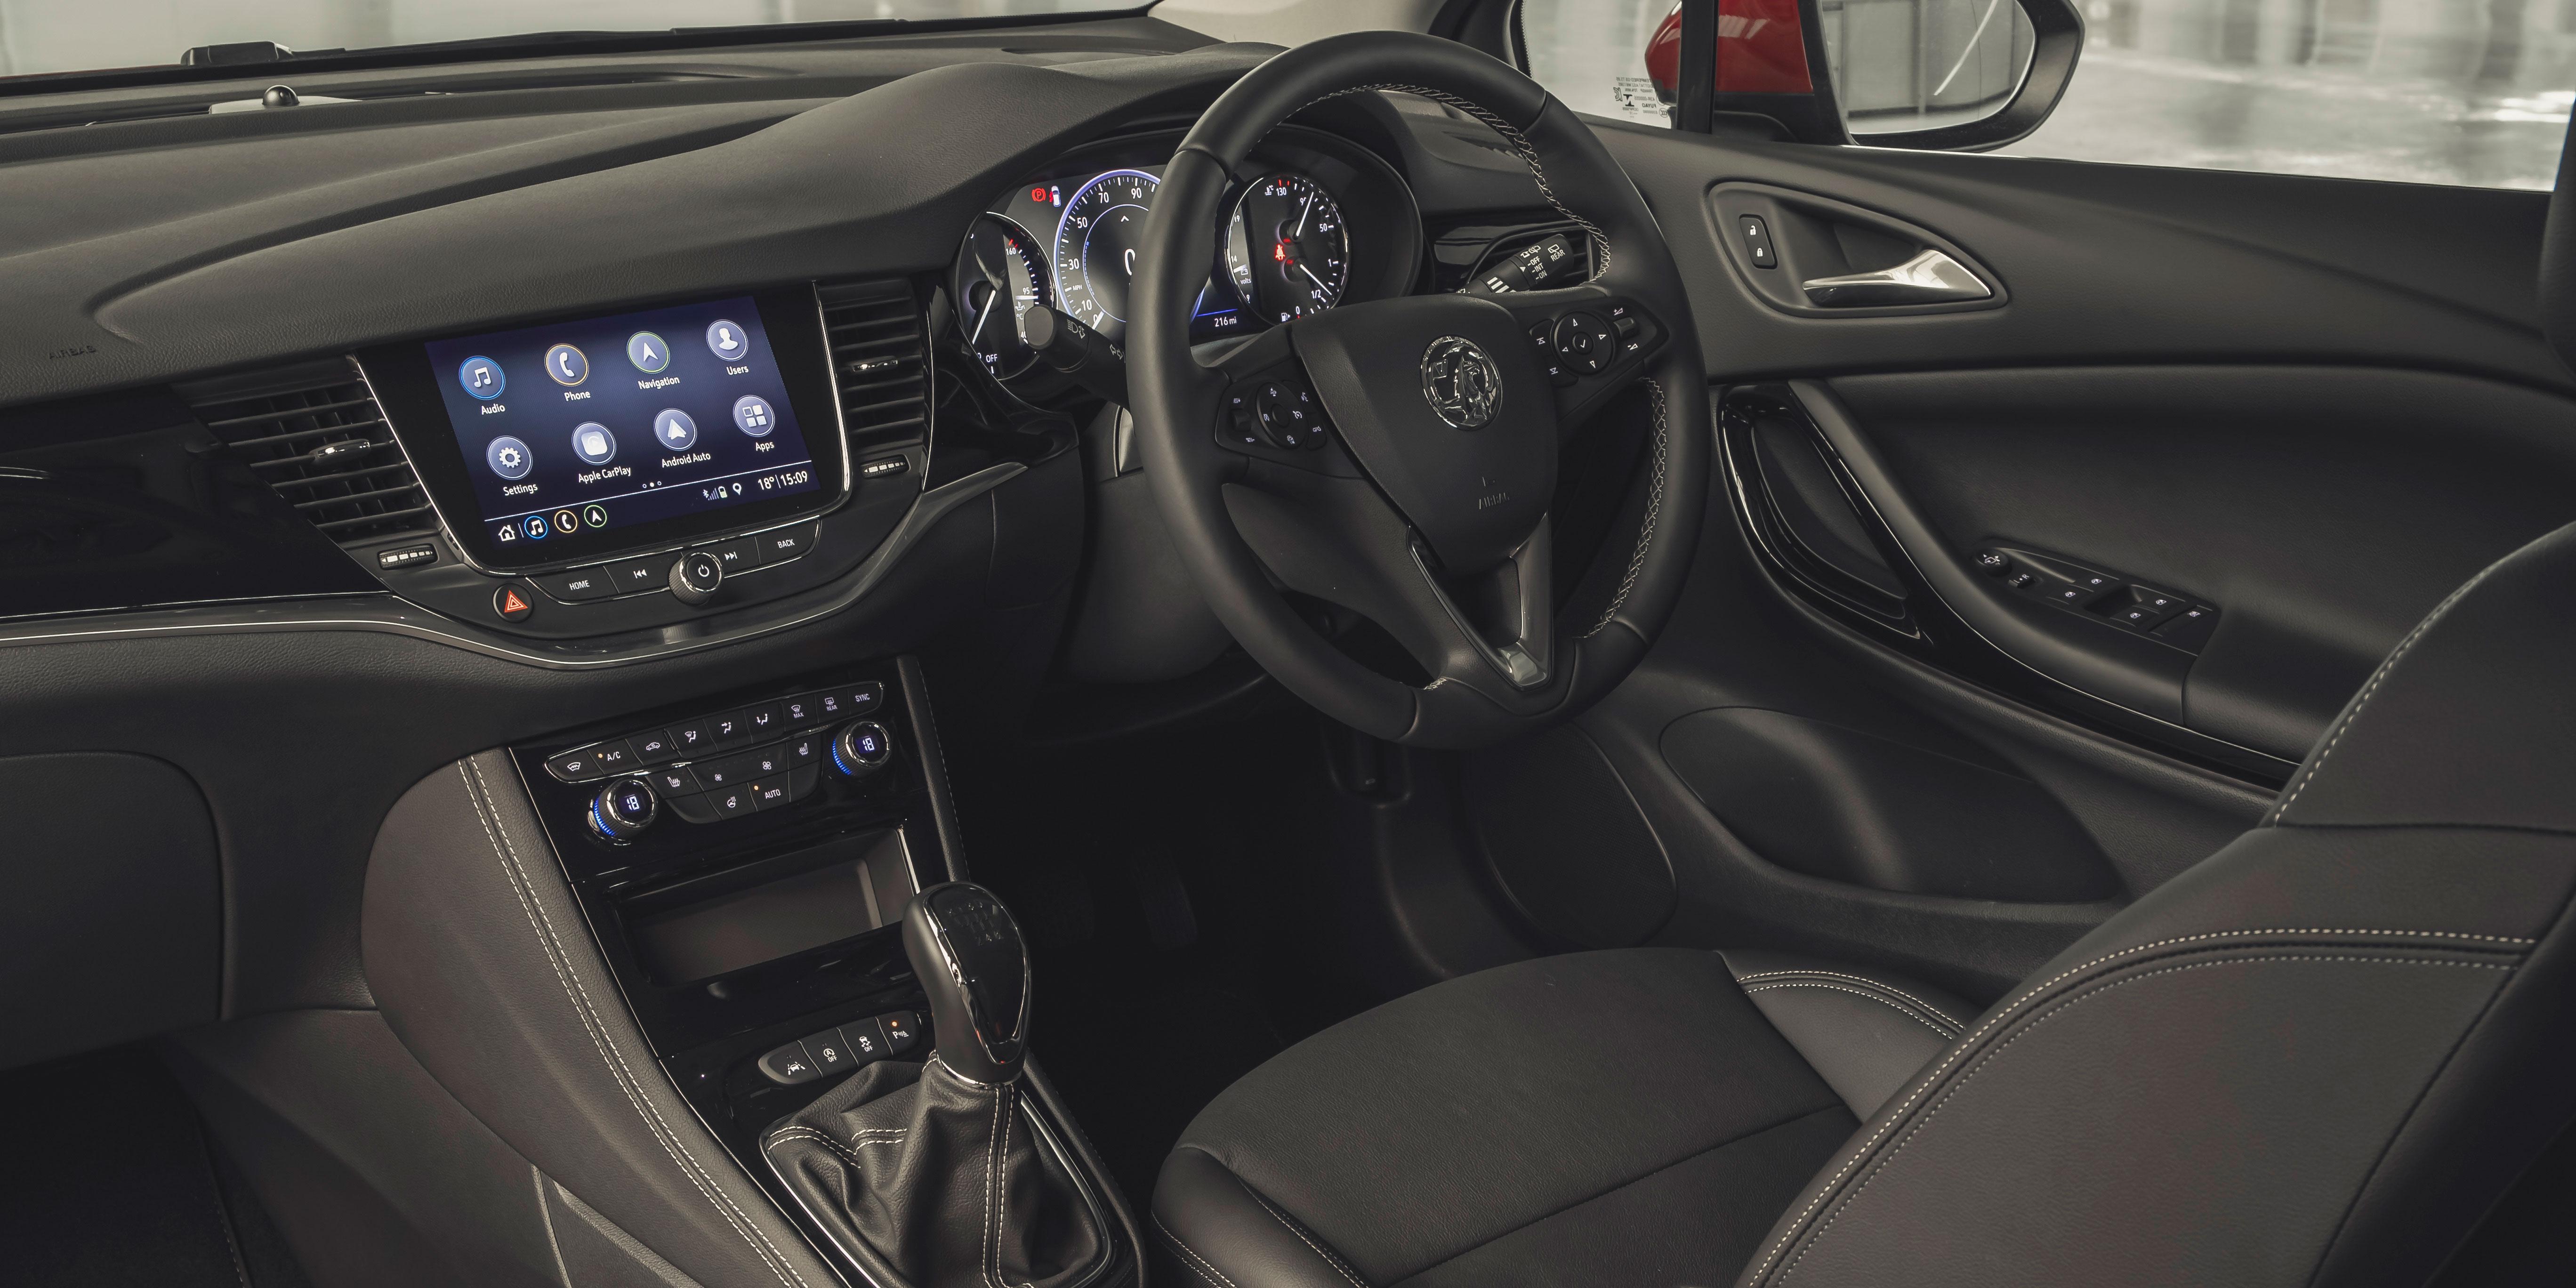 Vauxhall Astra Interior & Infotainment | carwow